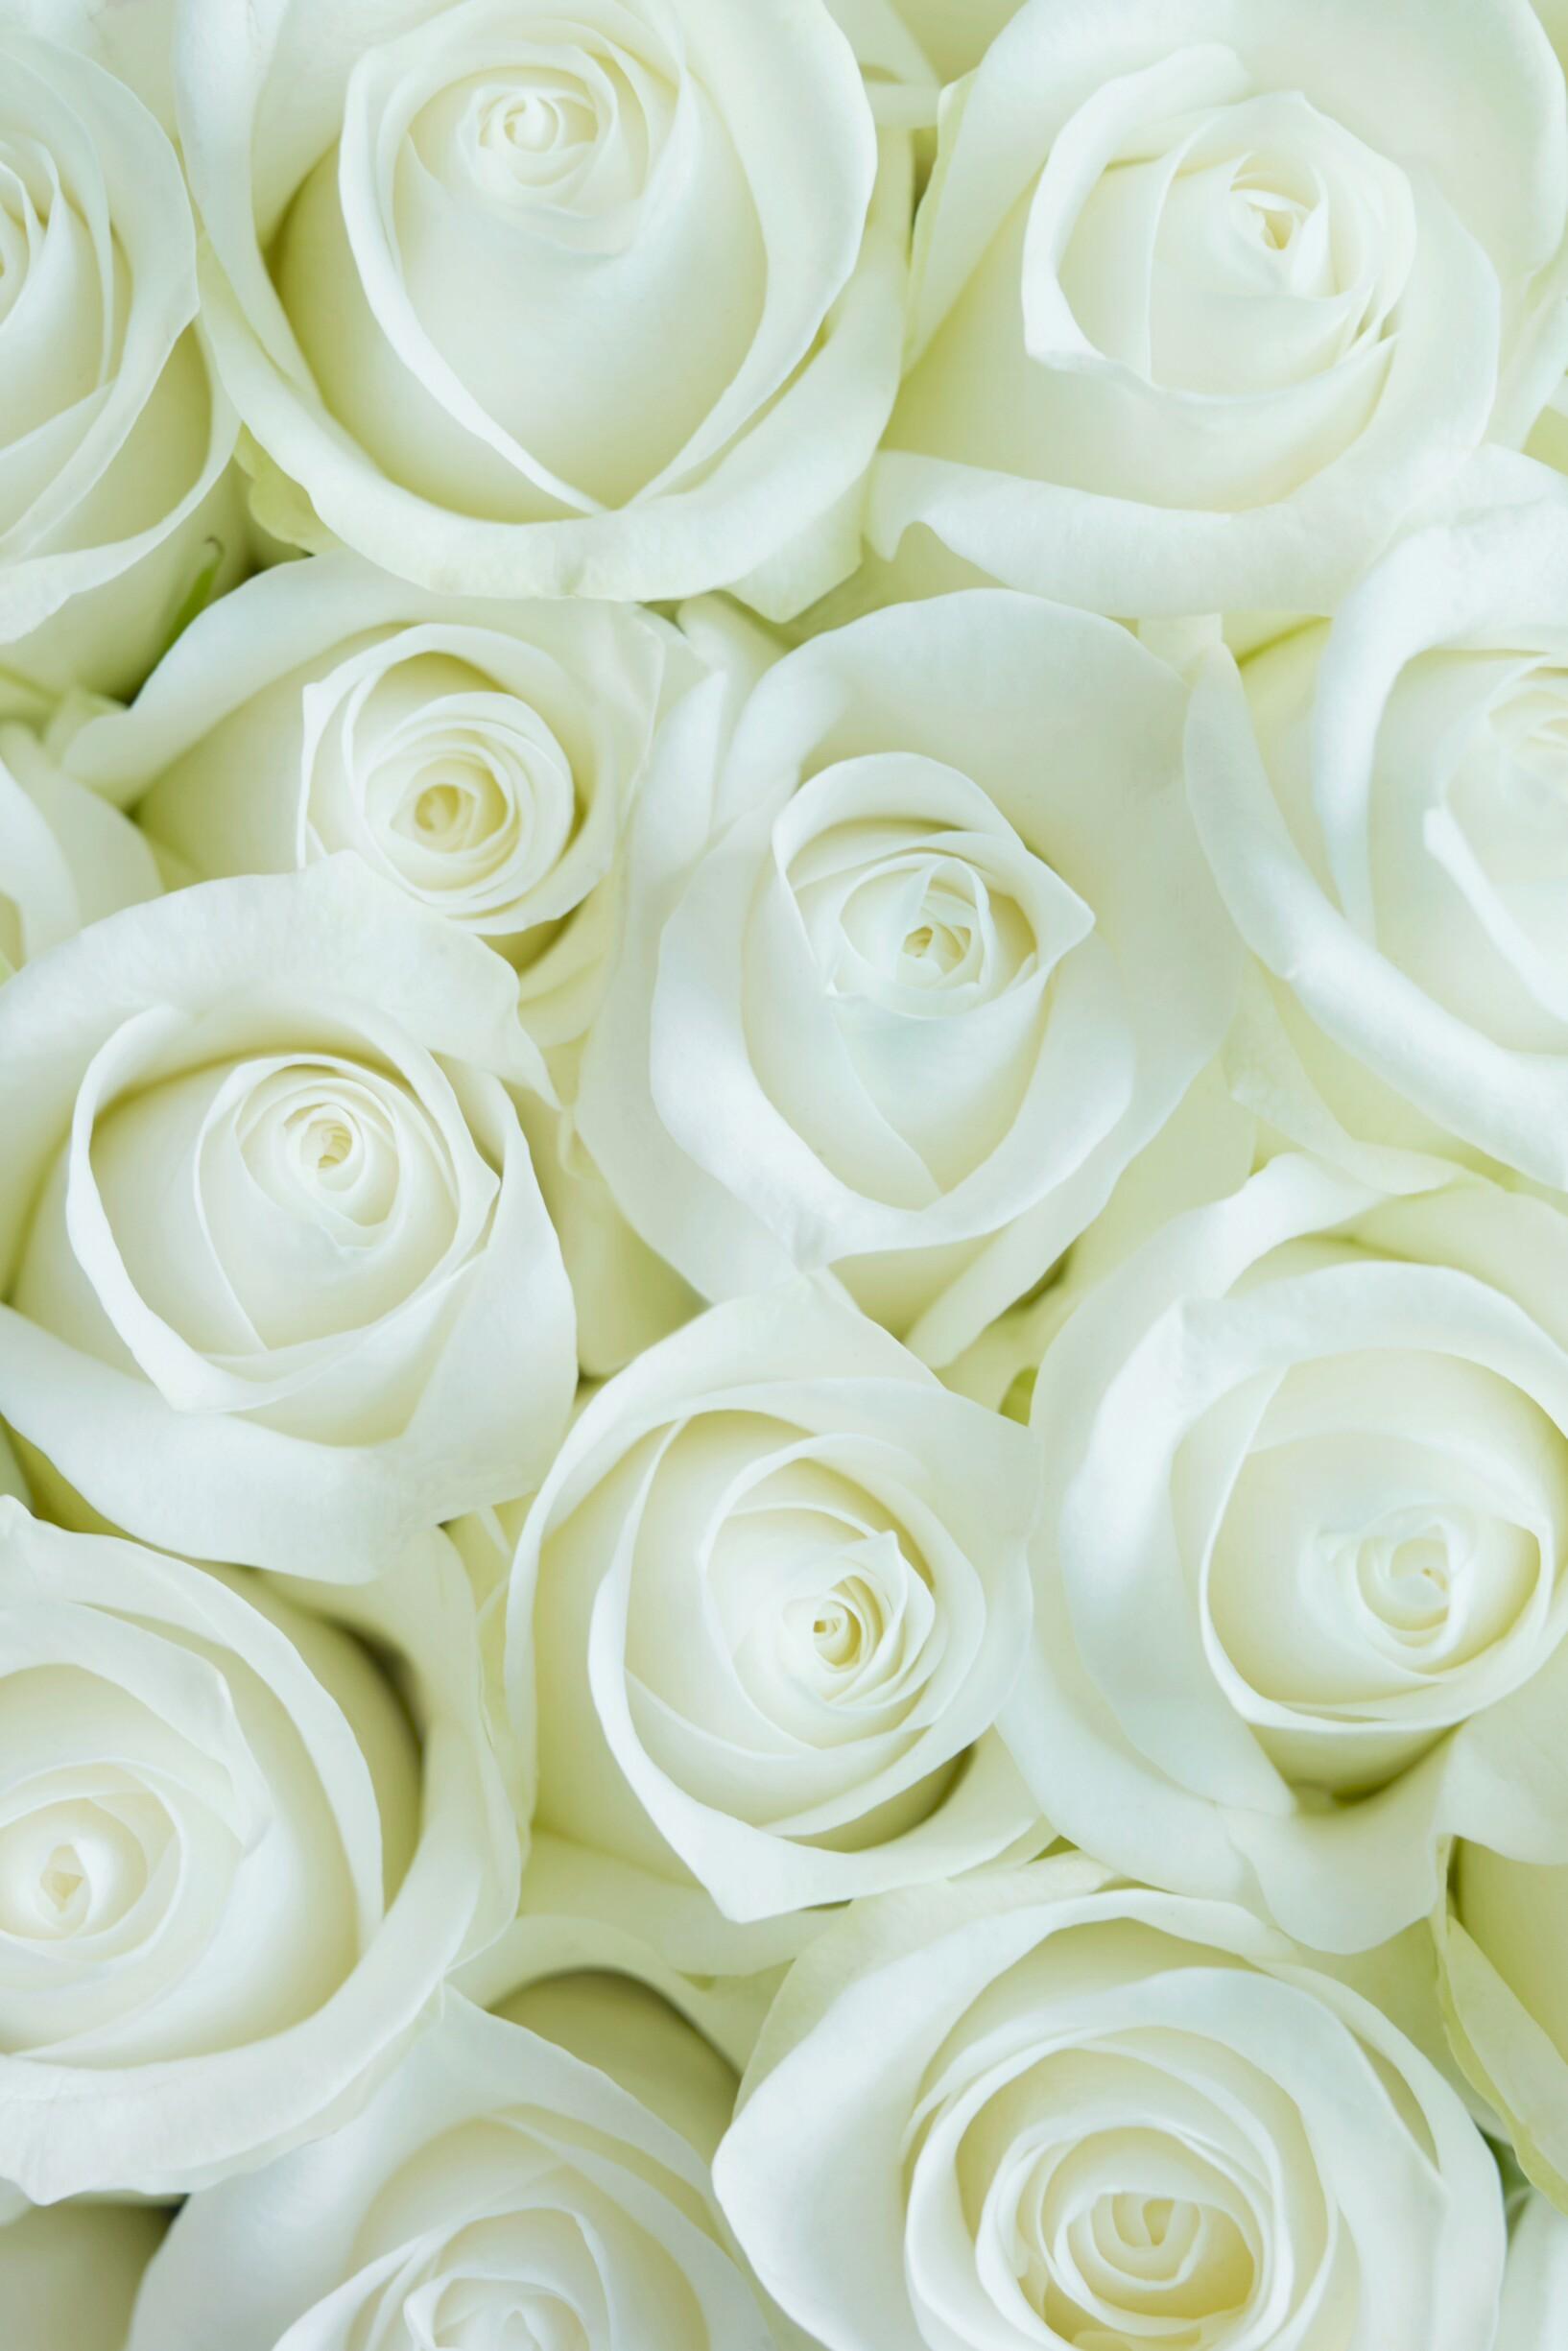 White rose wallpaper 1634x2450 wallpaper white roses flower for iphone resolution 1634x2450 download white mightylinksfo